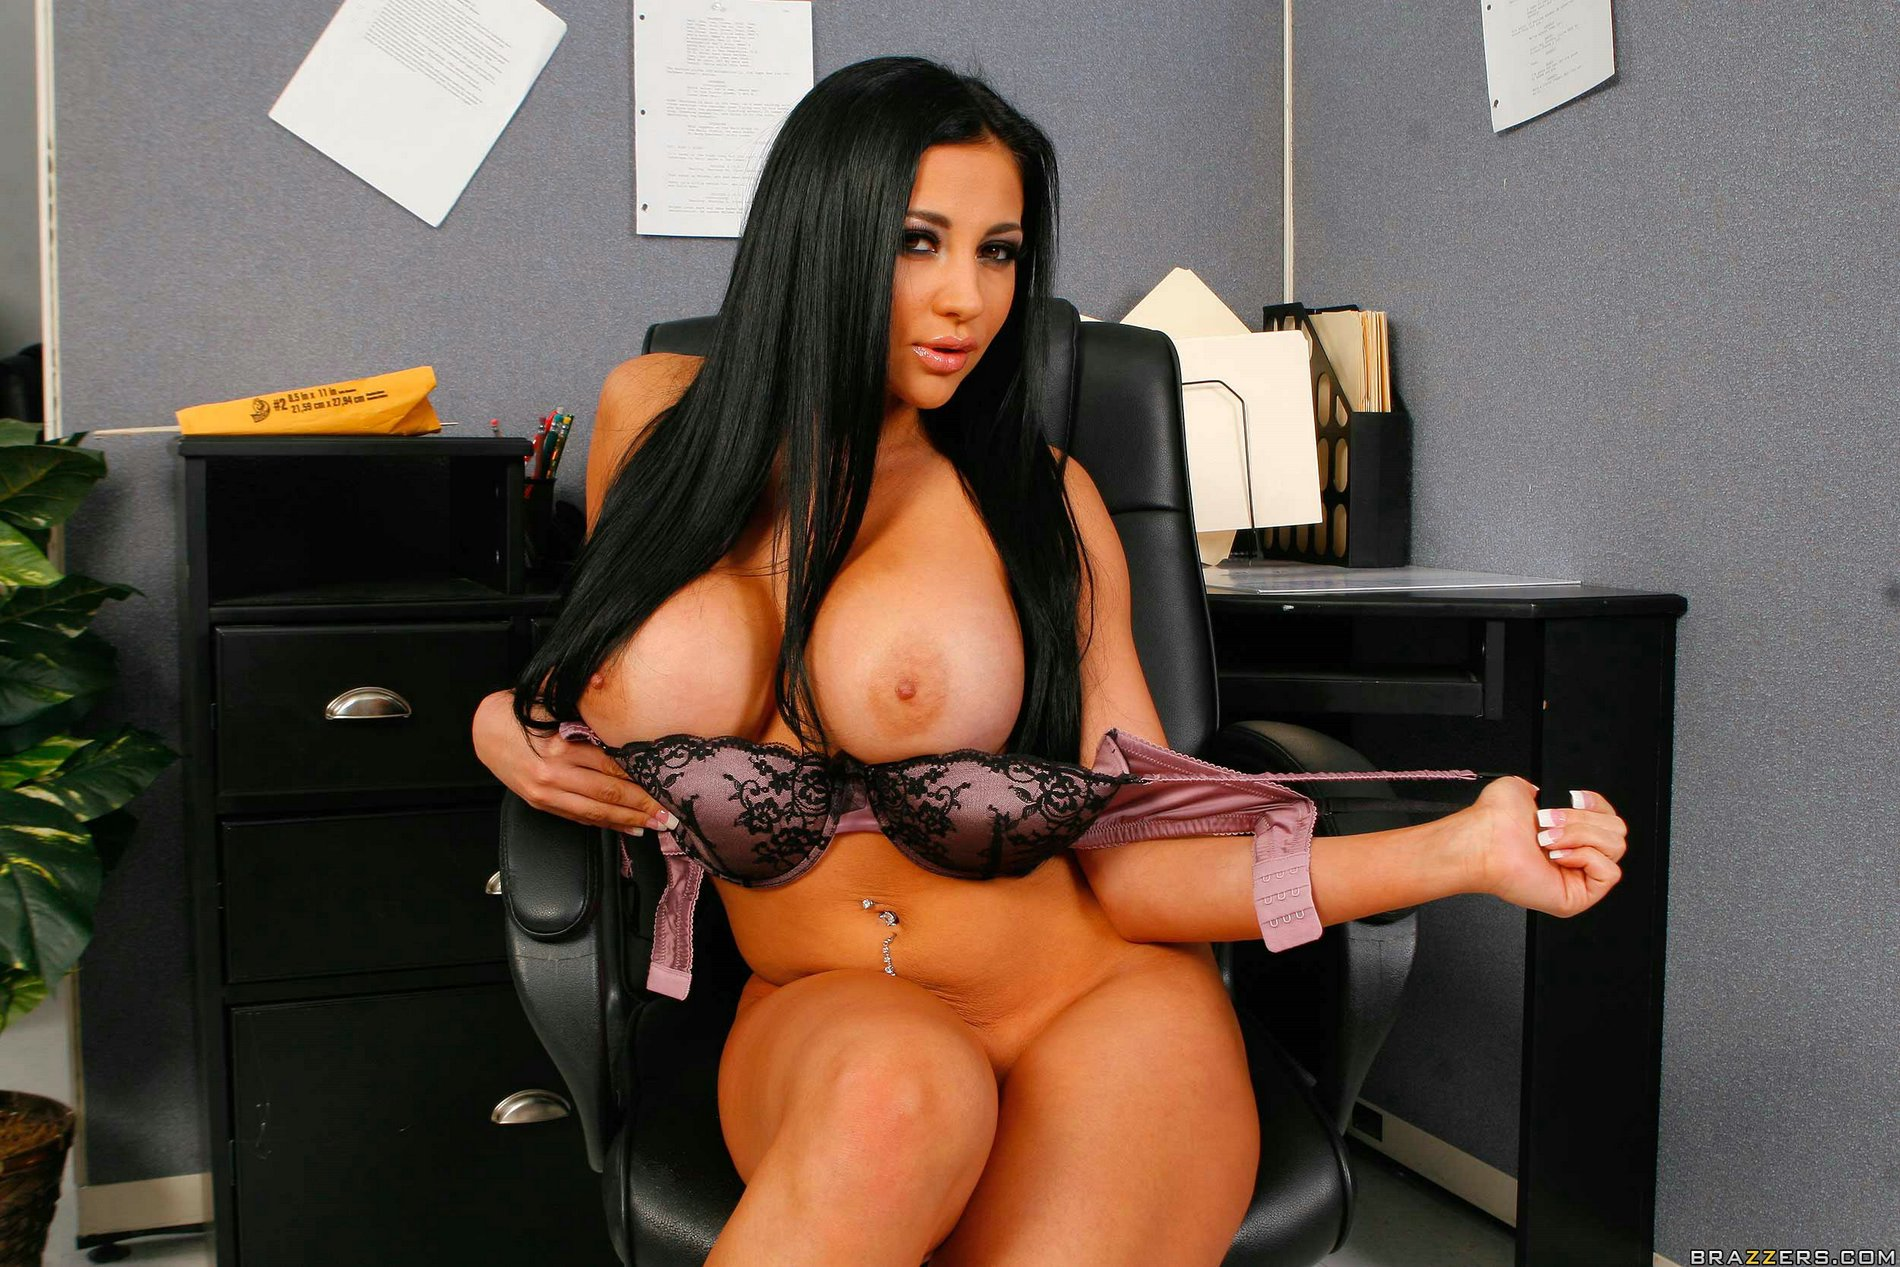 Audrey bitoni porn online-1177